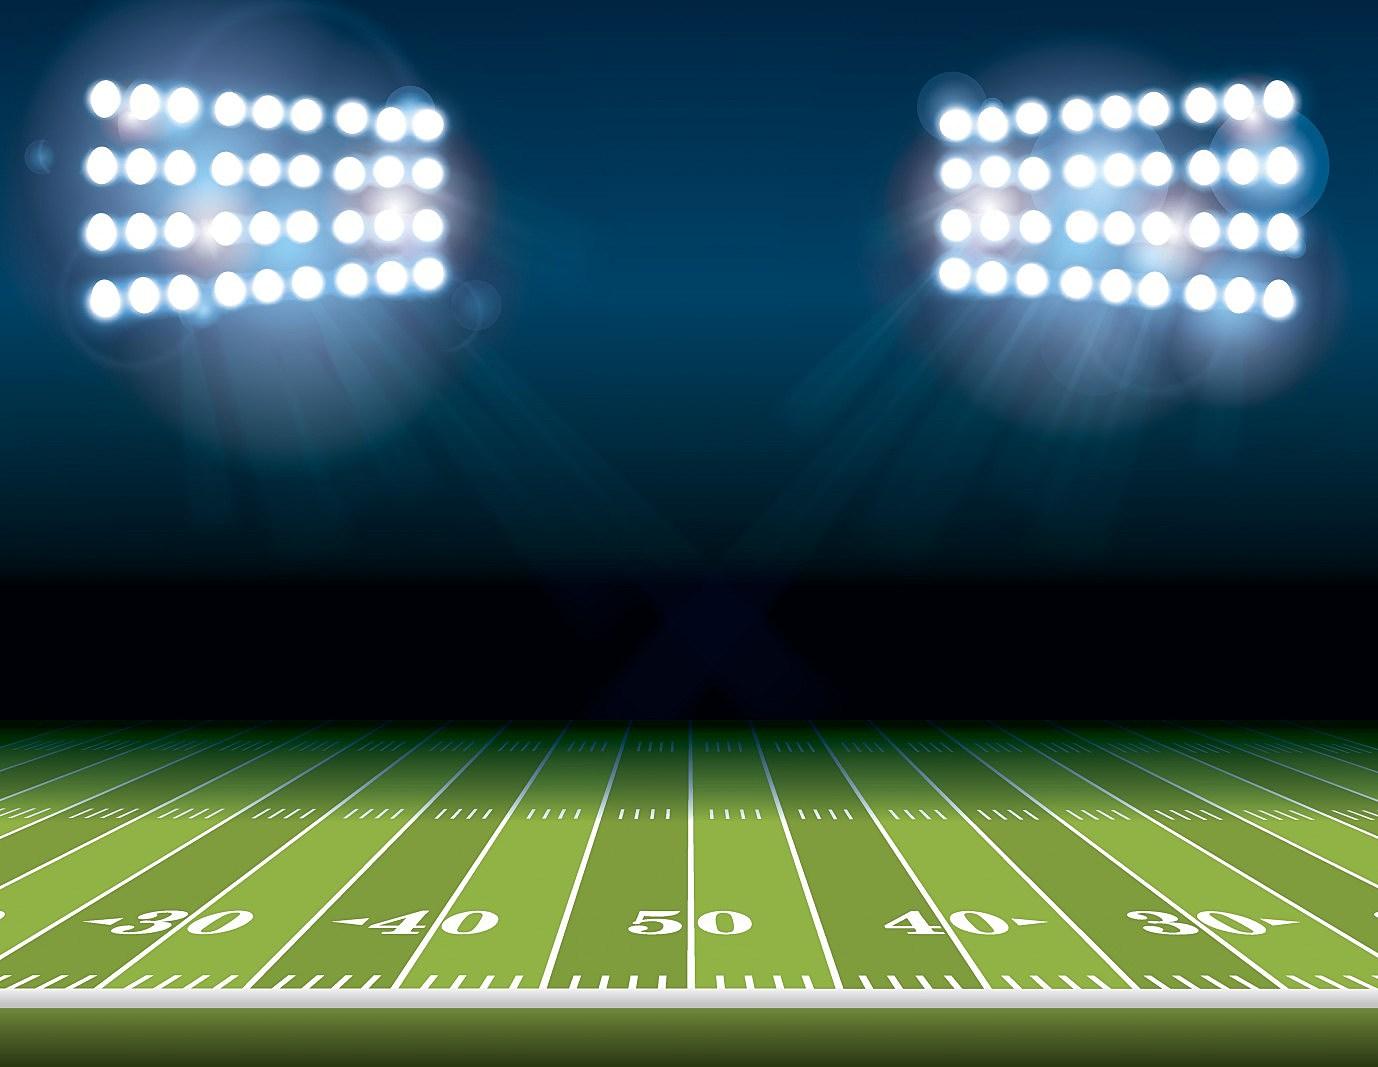 American Football Field with Stadium Lights